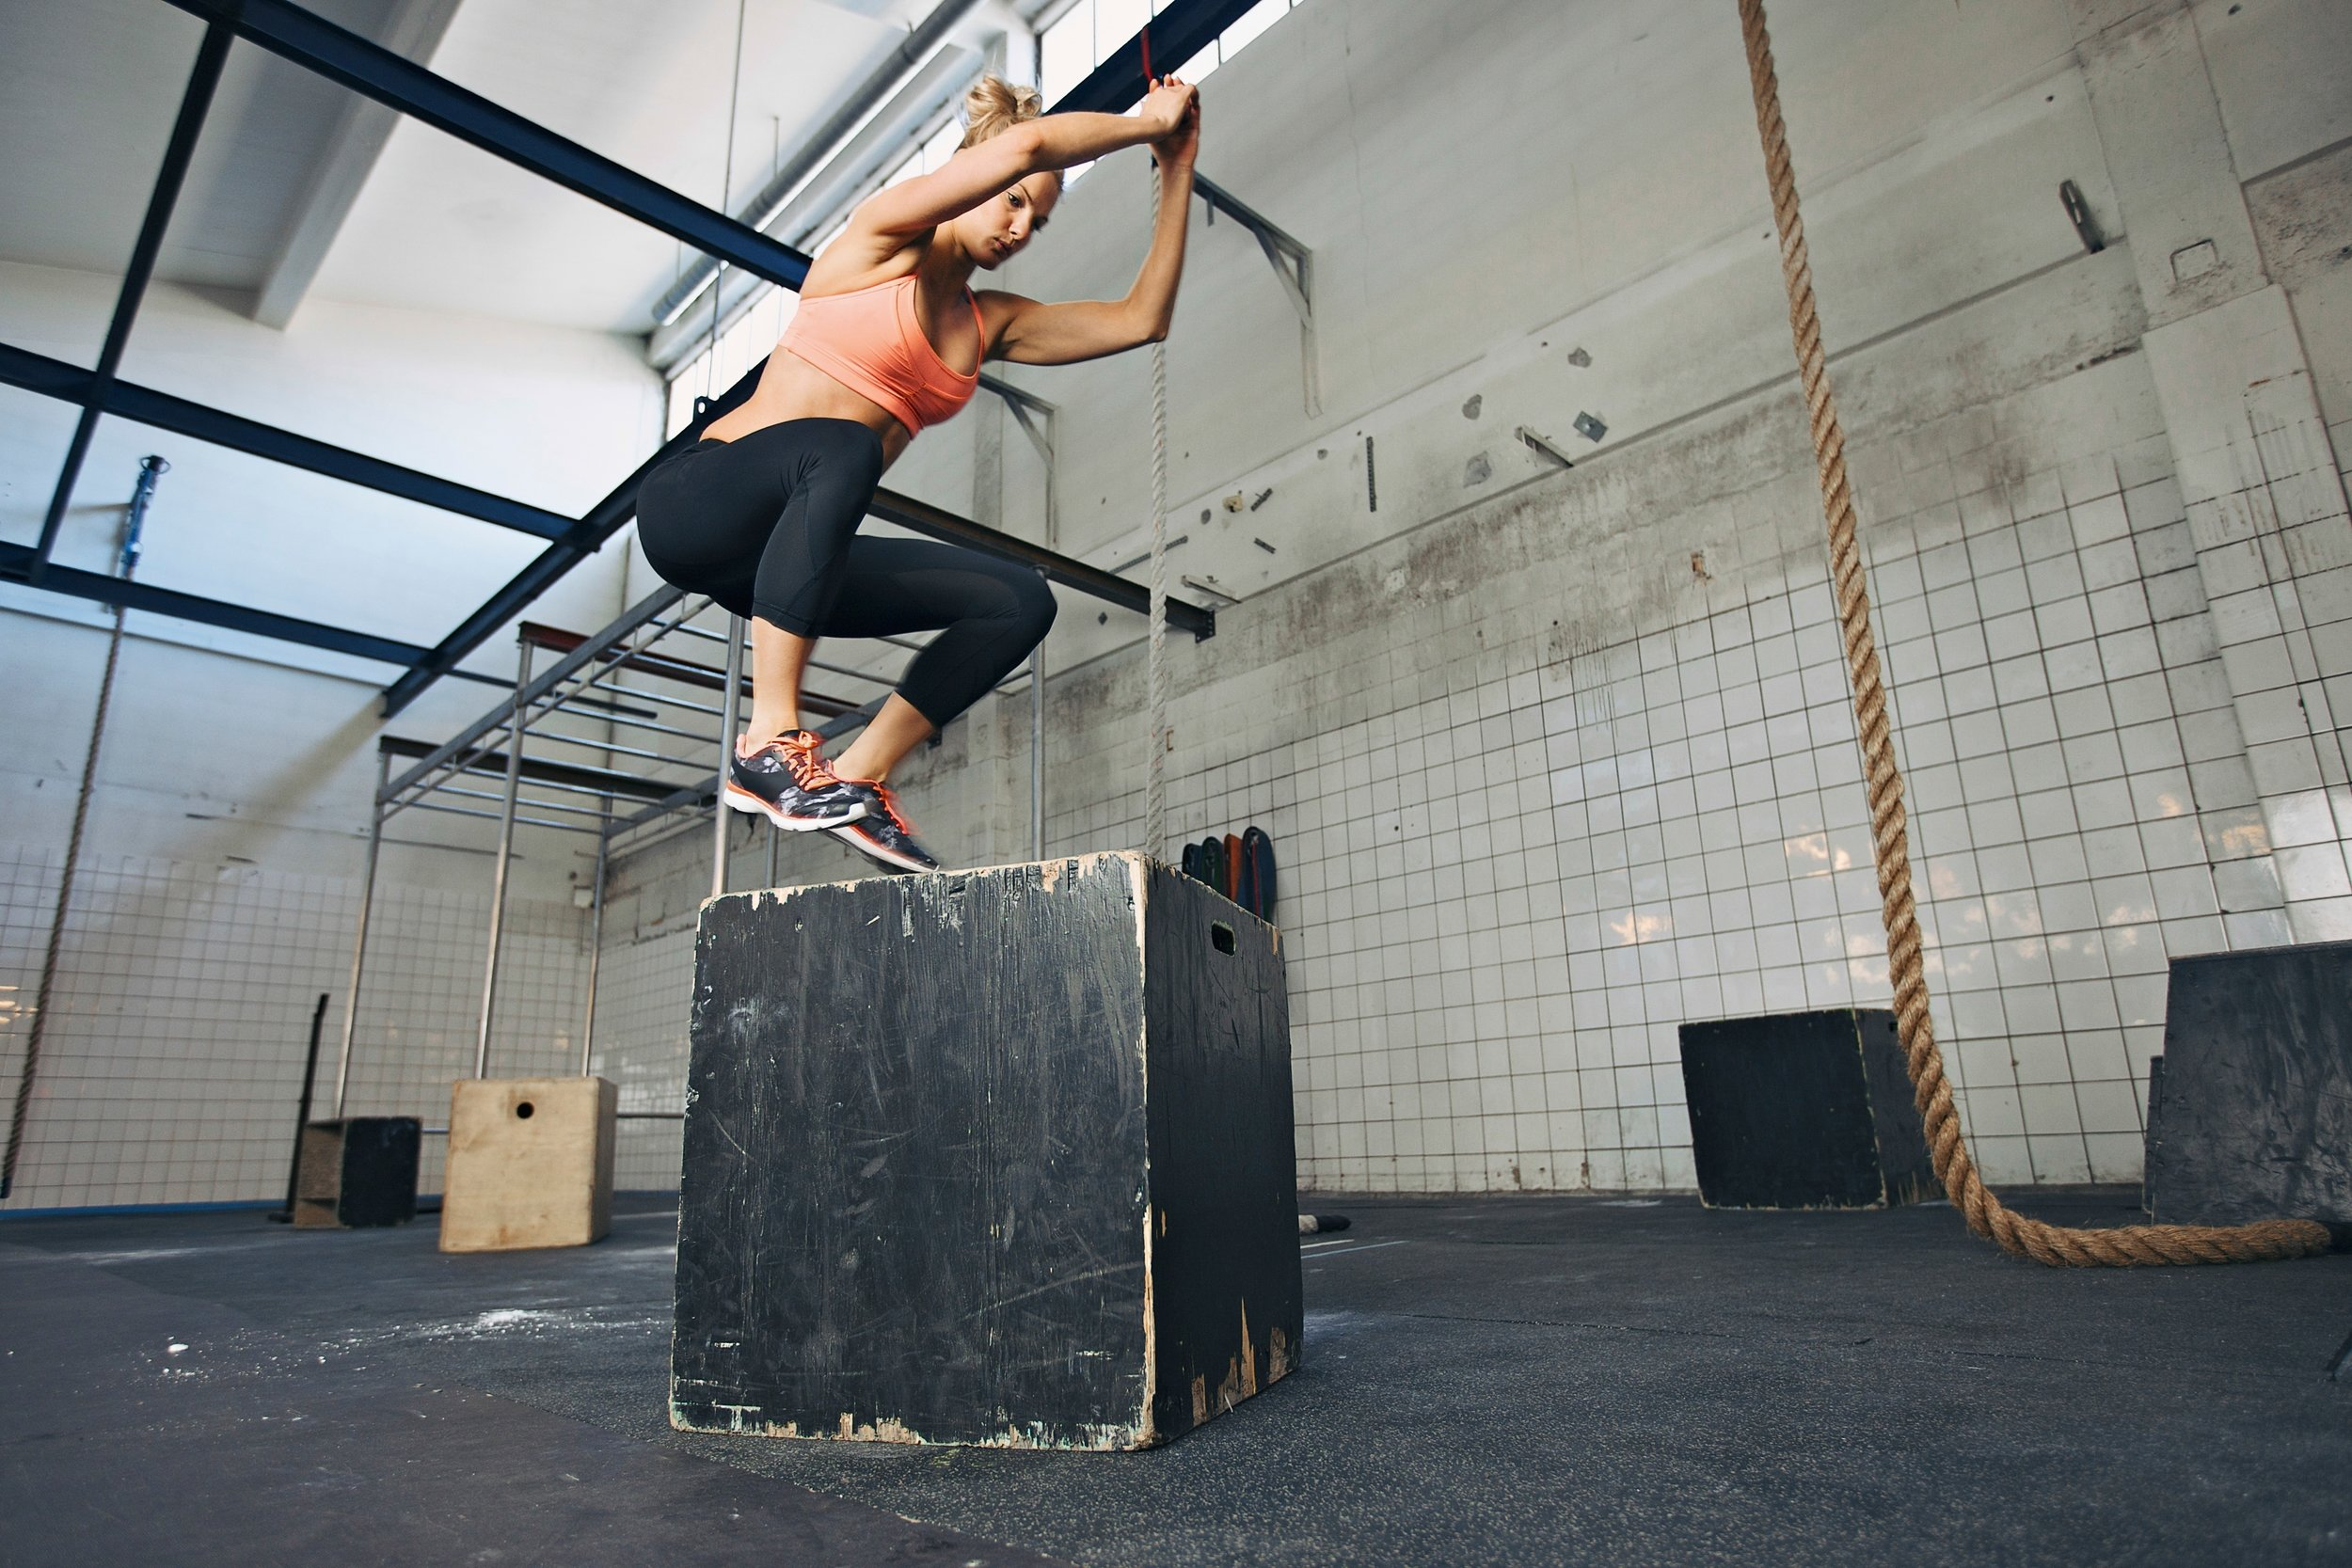 box-jumps-crossfit